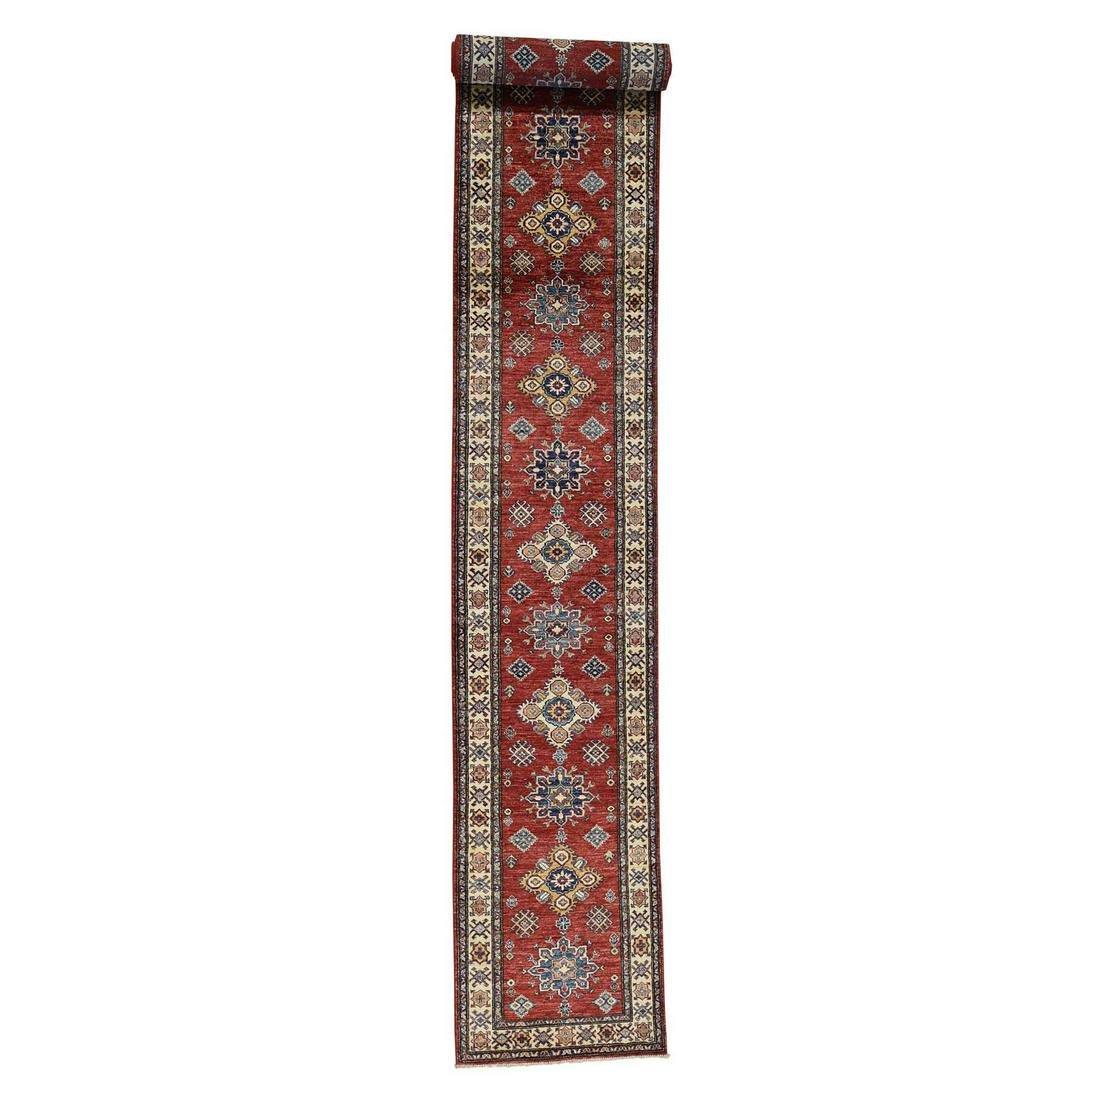 Red Super Kazak XL Runner Hand-Knotted Pure Wool Rug